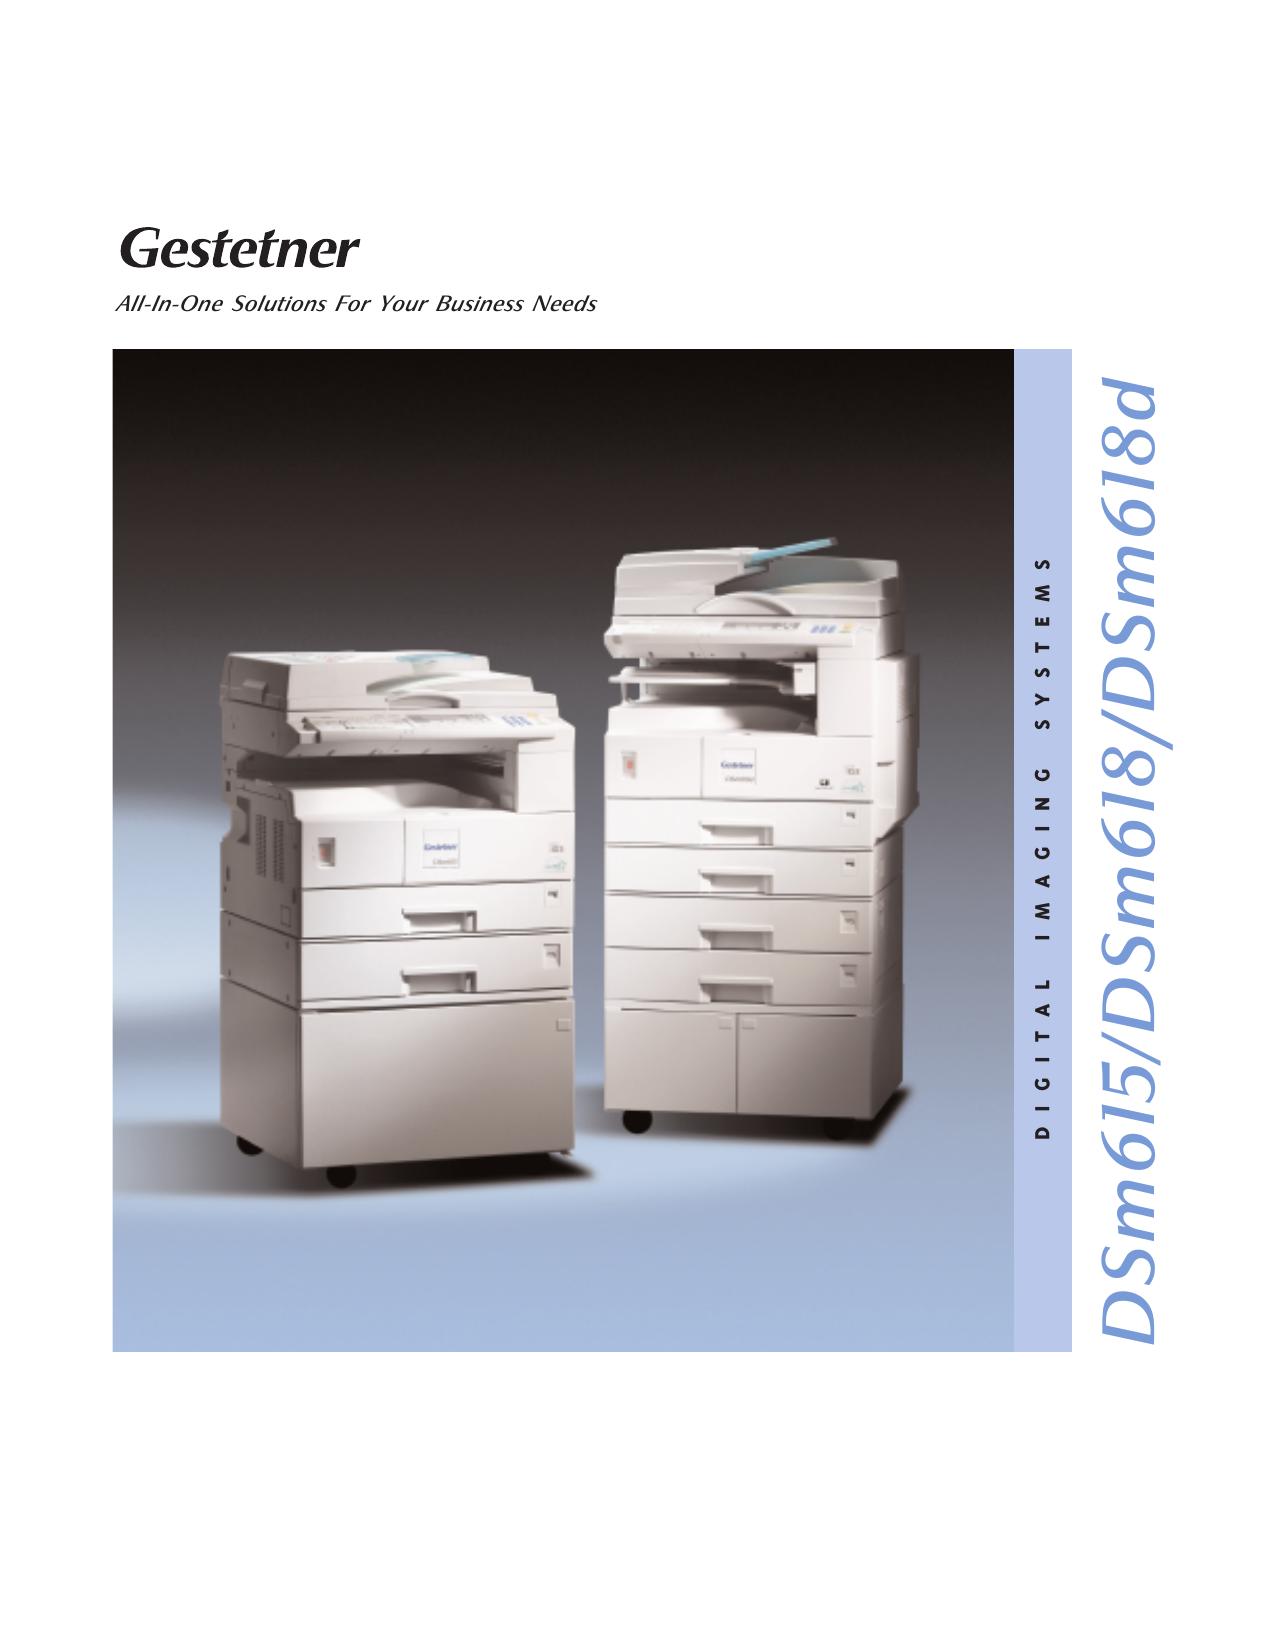 GESTETNER DSM618D WINDOWS 8 X64 TREIBER